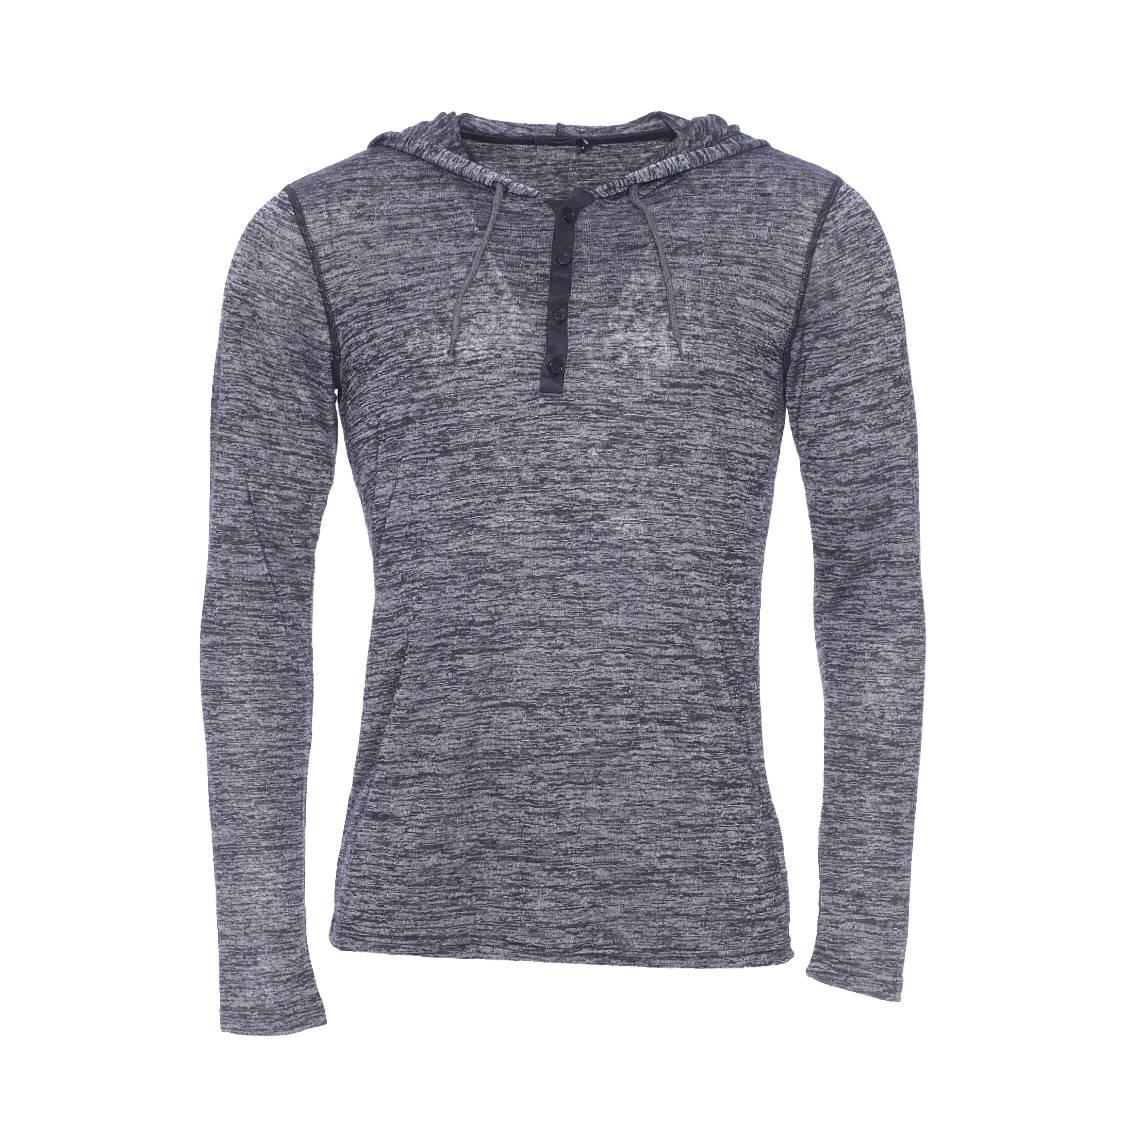 tee shirt best mountain tissage flamm gris et noir capuche rue des hommes. Black Bedroom Furniture Sets. Home Design Ideas